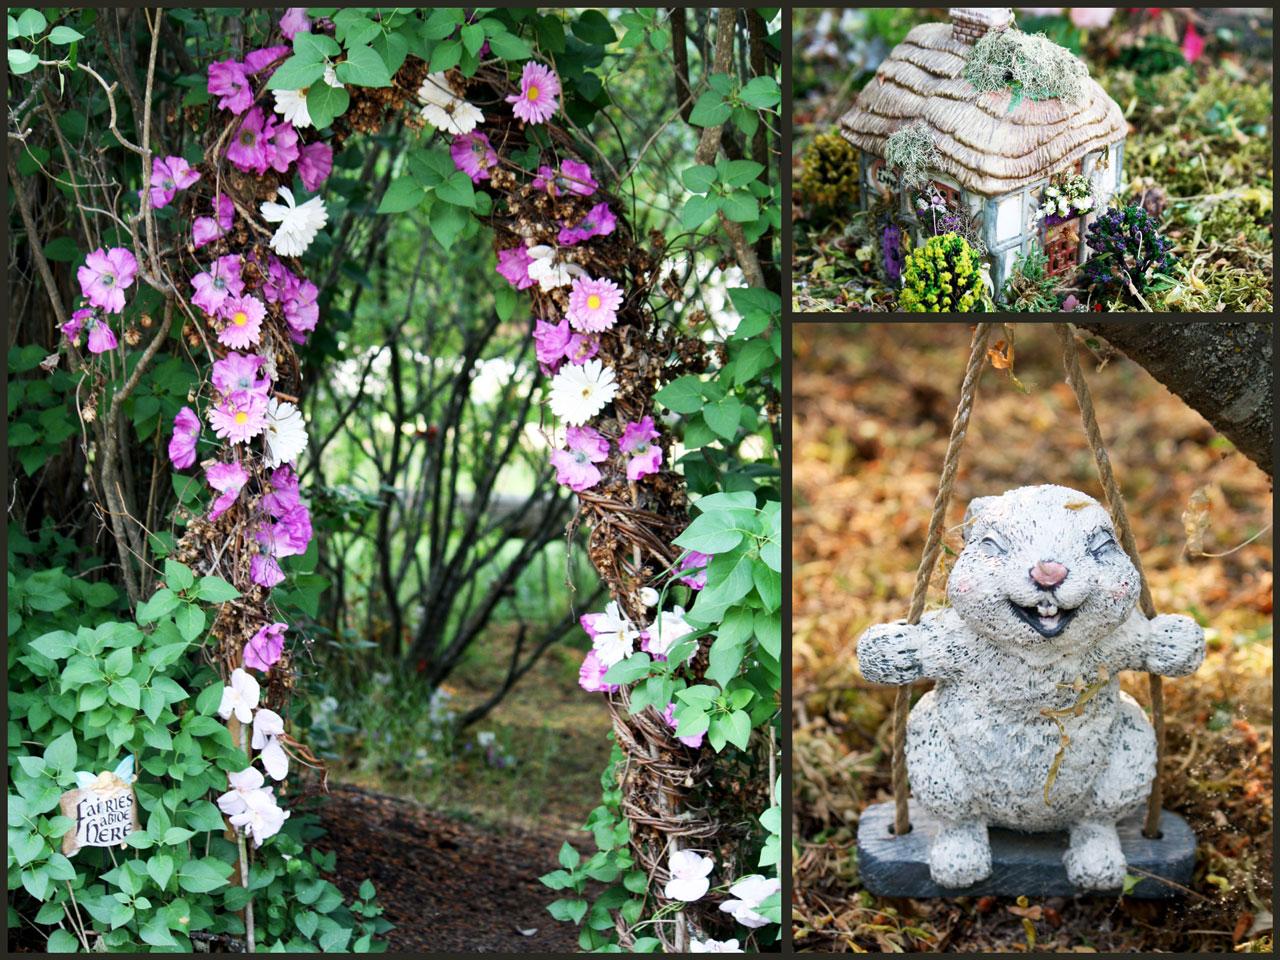 Fairy Garden at Columbia Wetlands Outpost